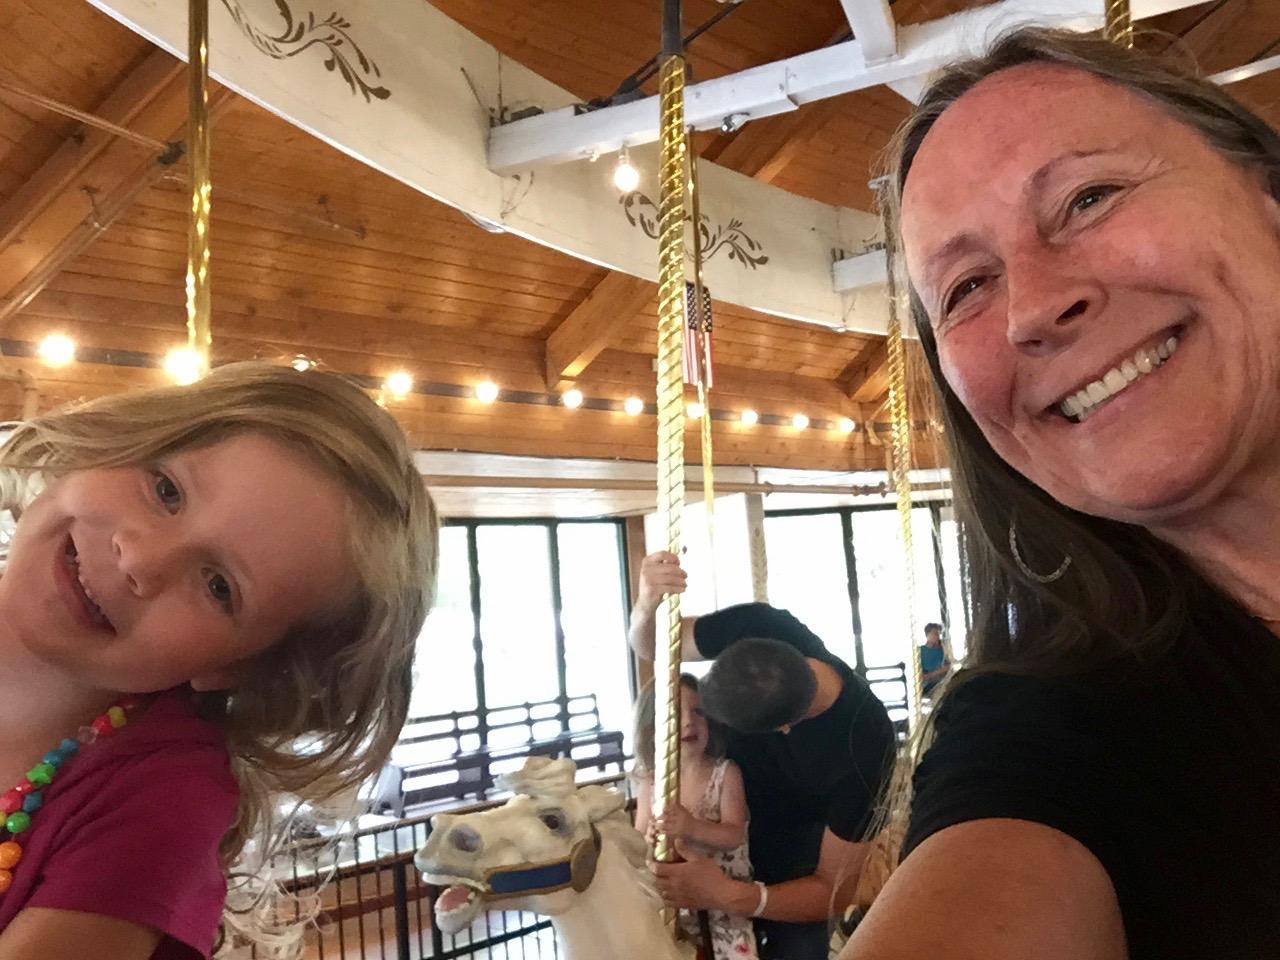 Riding the Merry-Go-Round in Spokane WA